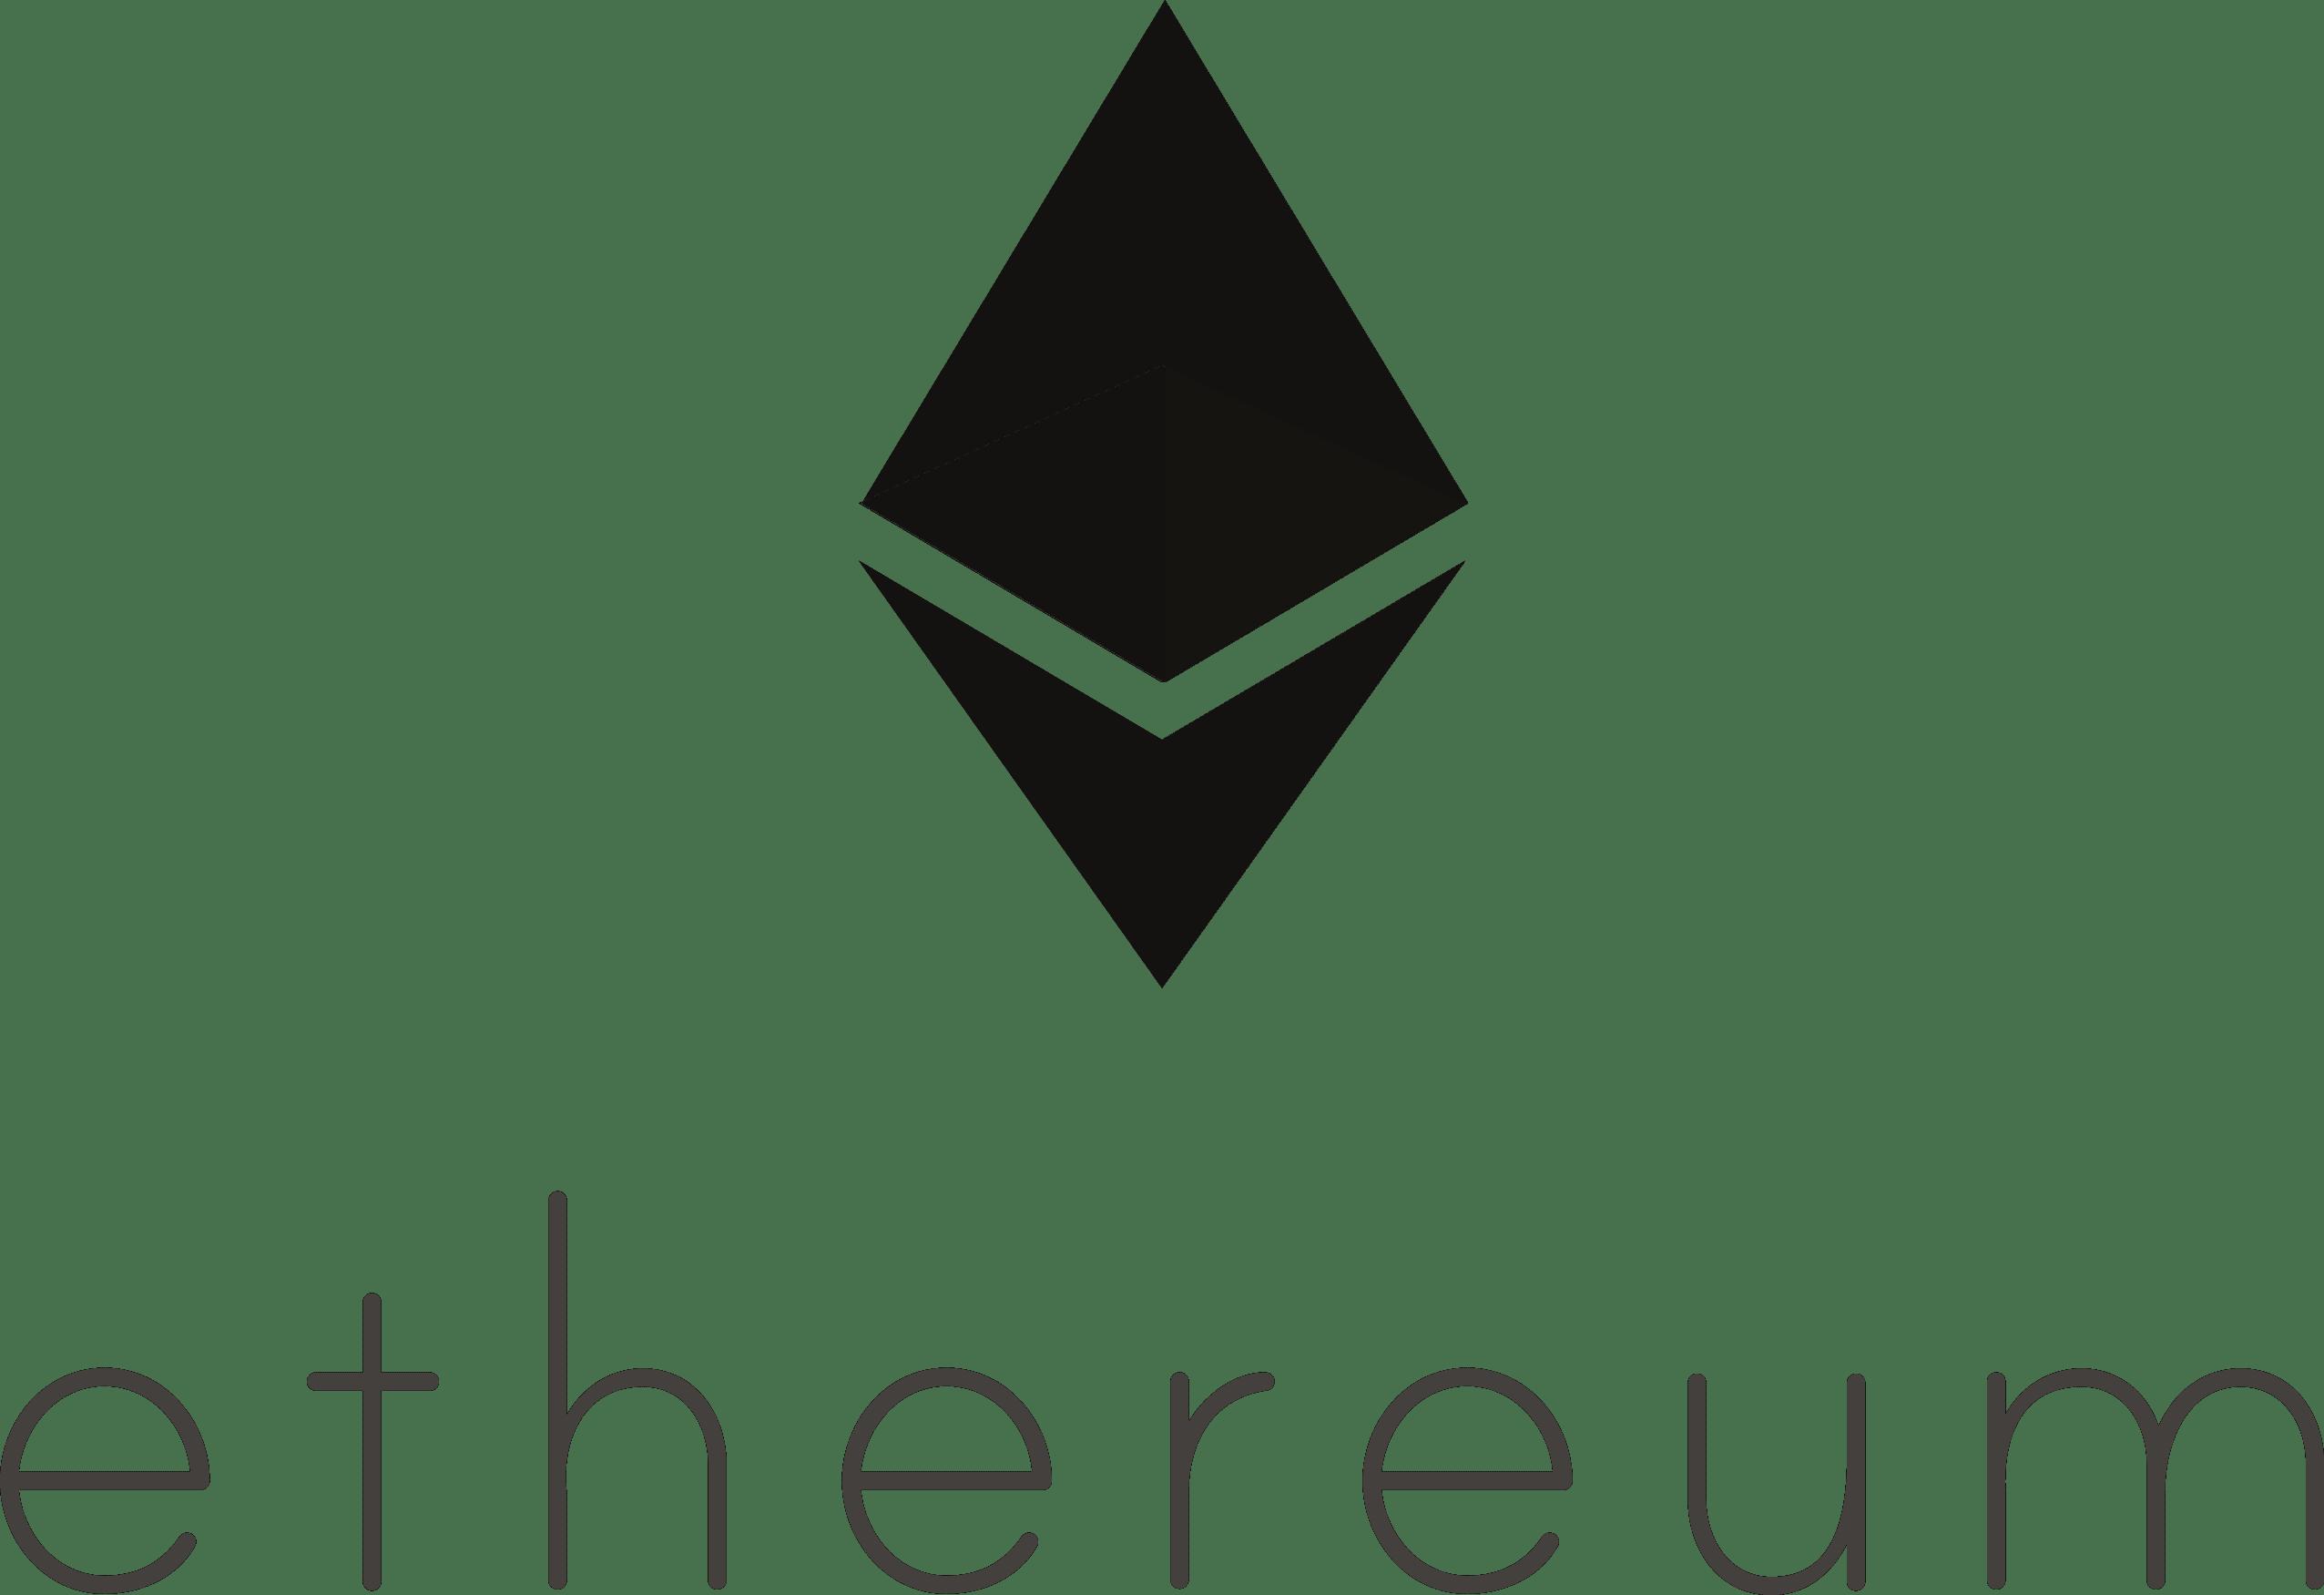 How to Buy Ethereum UK - Beginner's Guide - BuyShares.co.uk